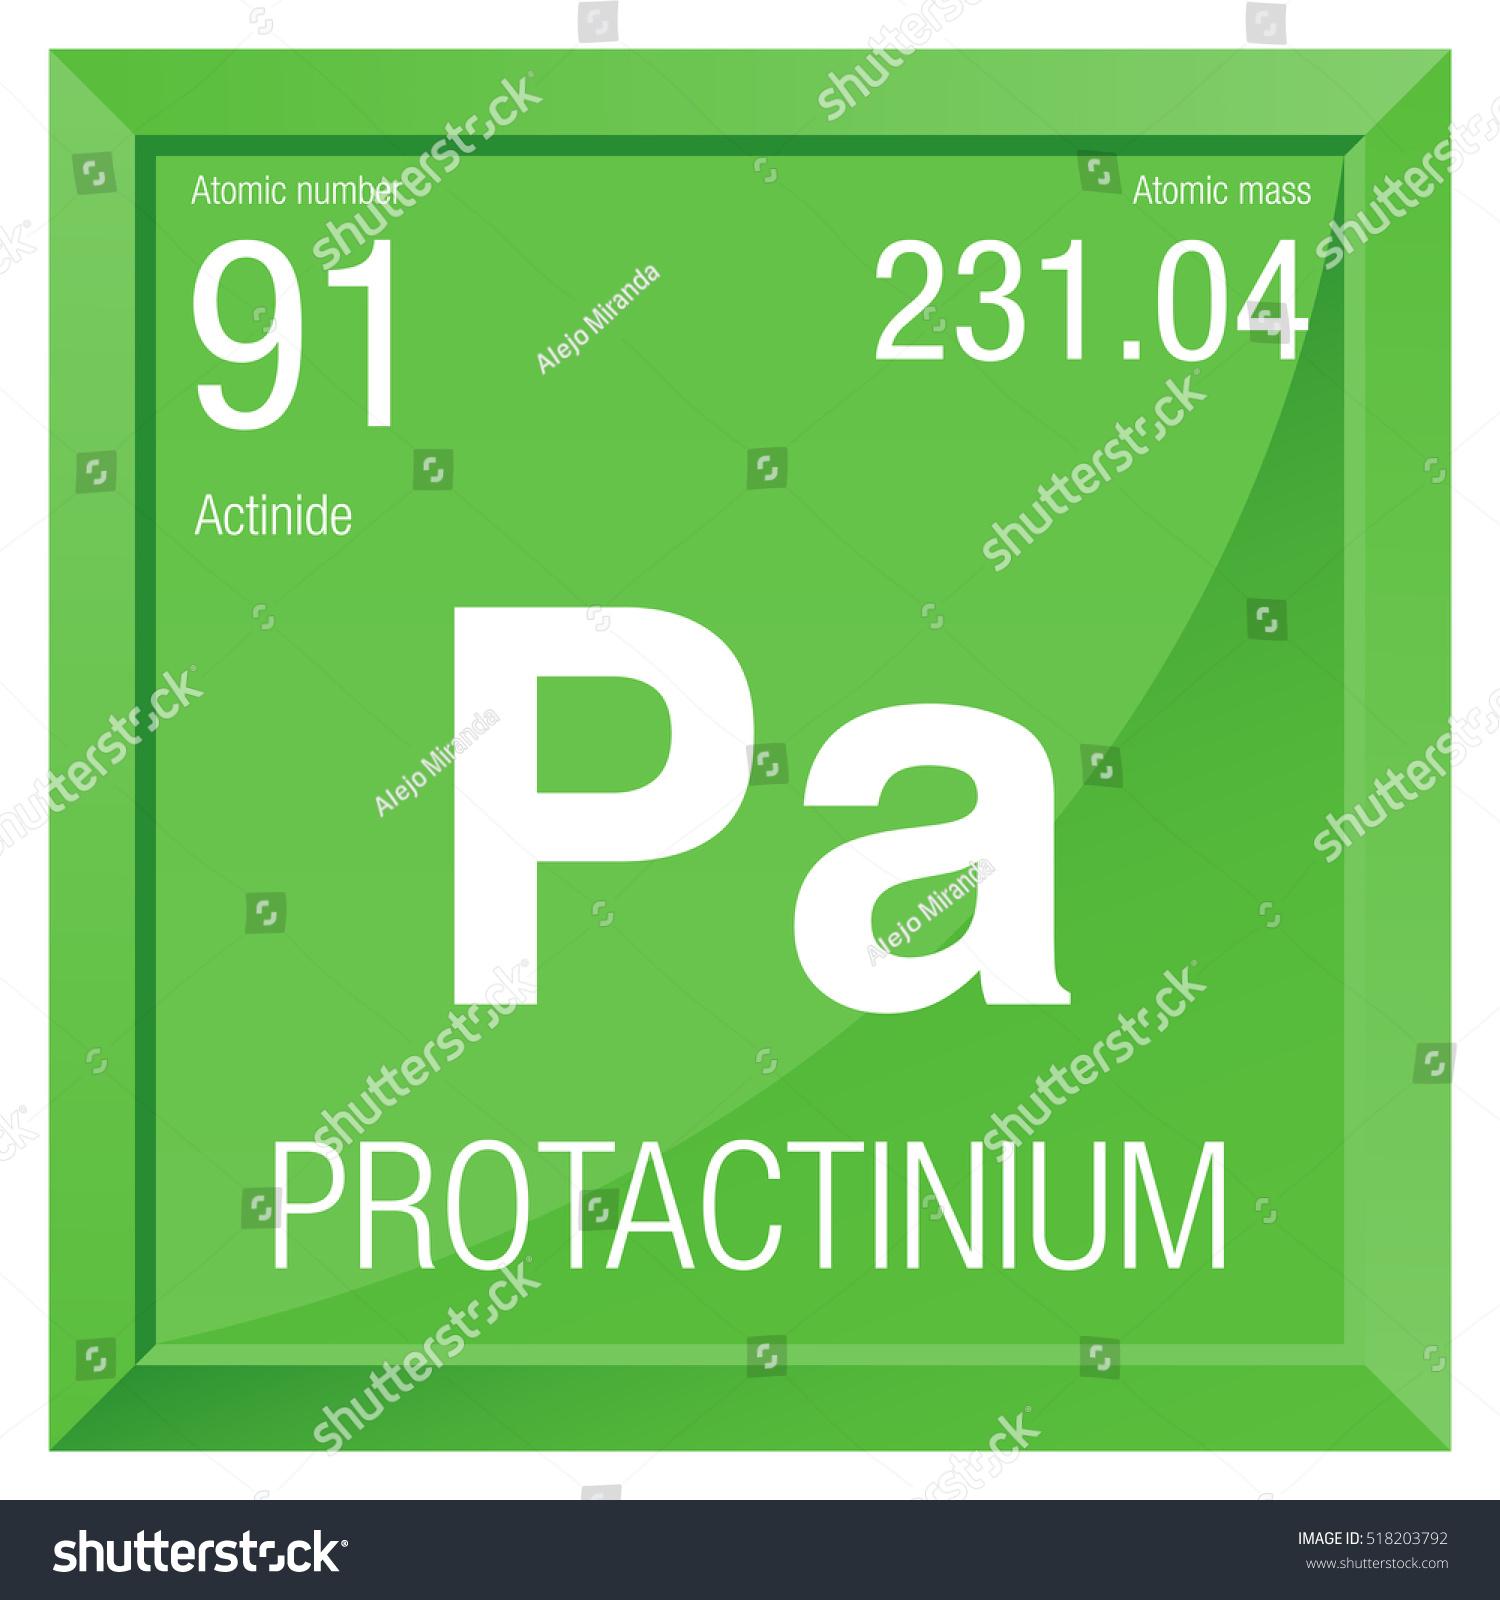 Protactinium symbol element number 91 periodic stock vector 2018 protactinium symbol element number 91 of the periodic table of the elements chemistry urtaz Choice Image